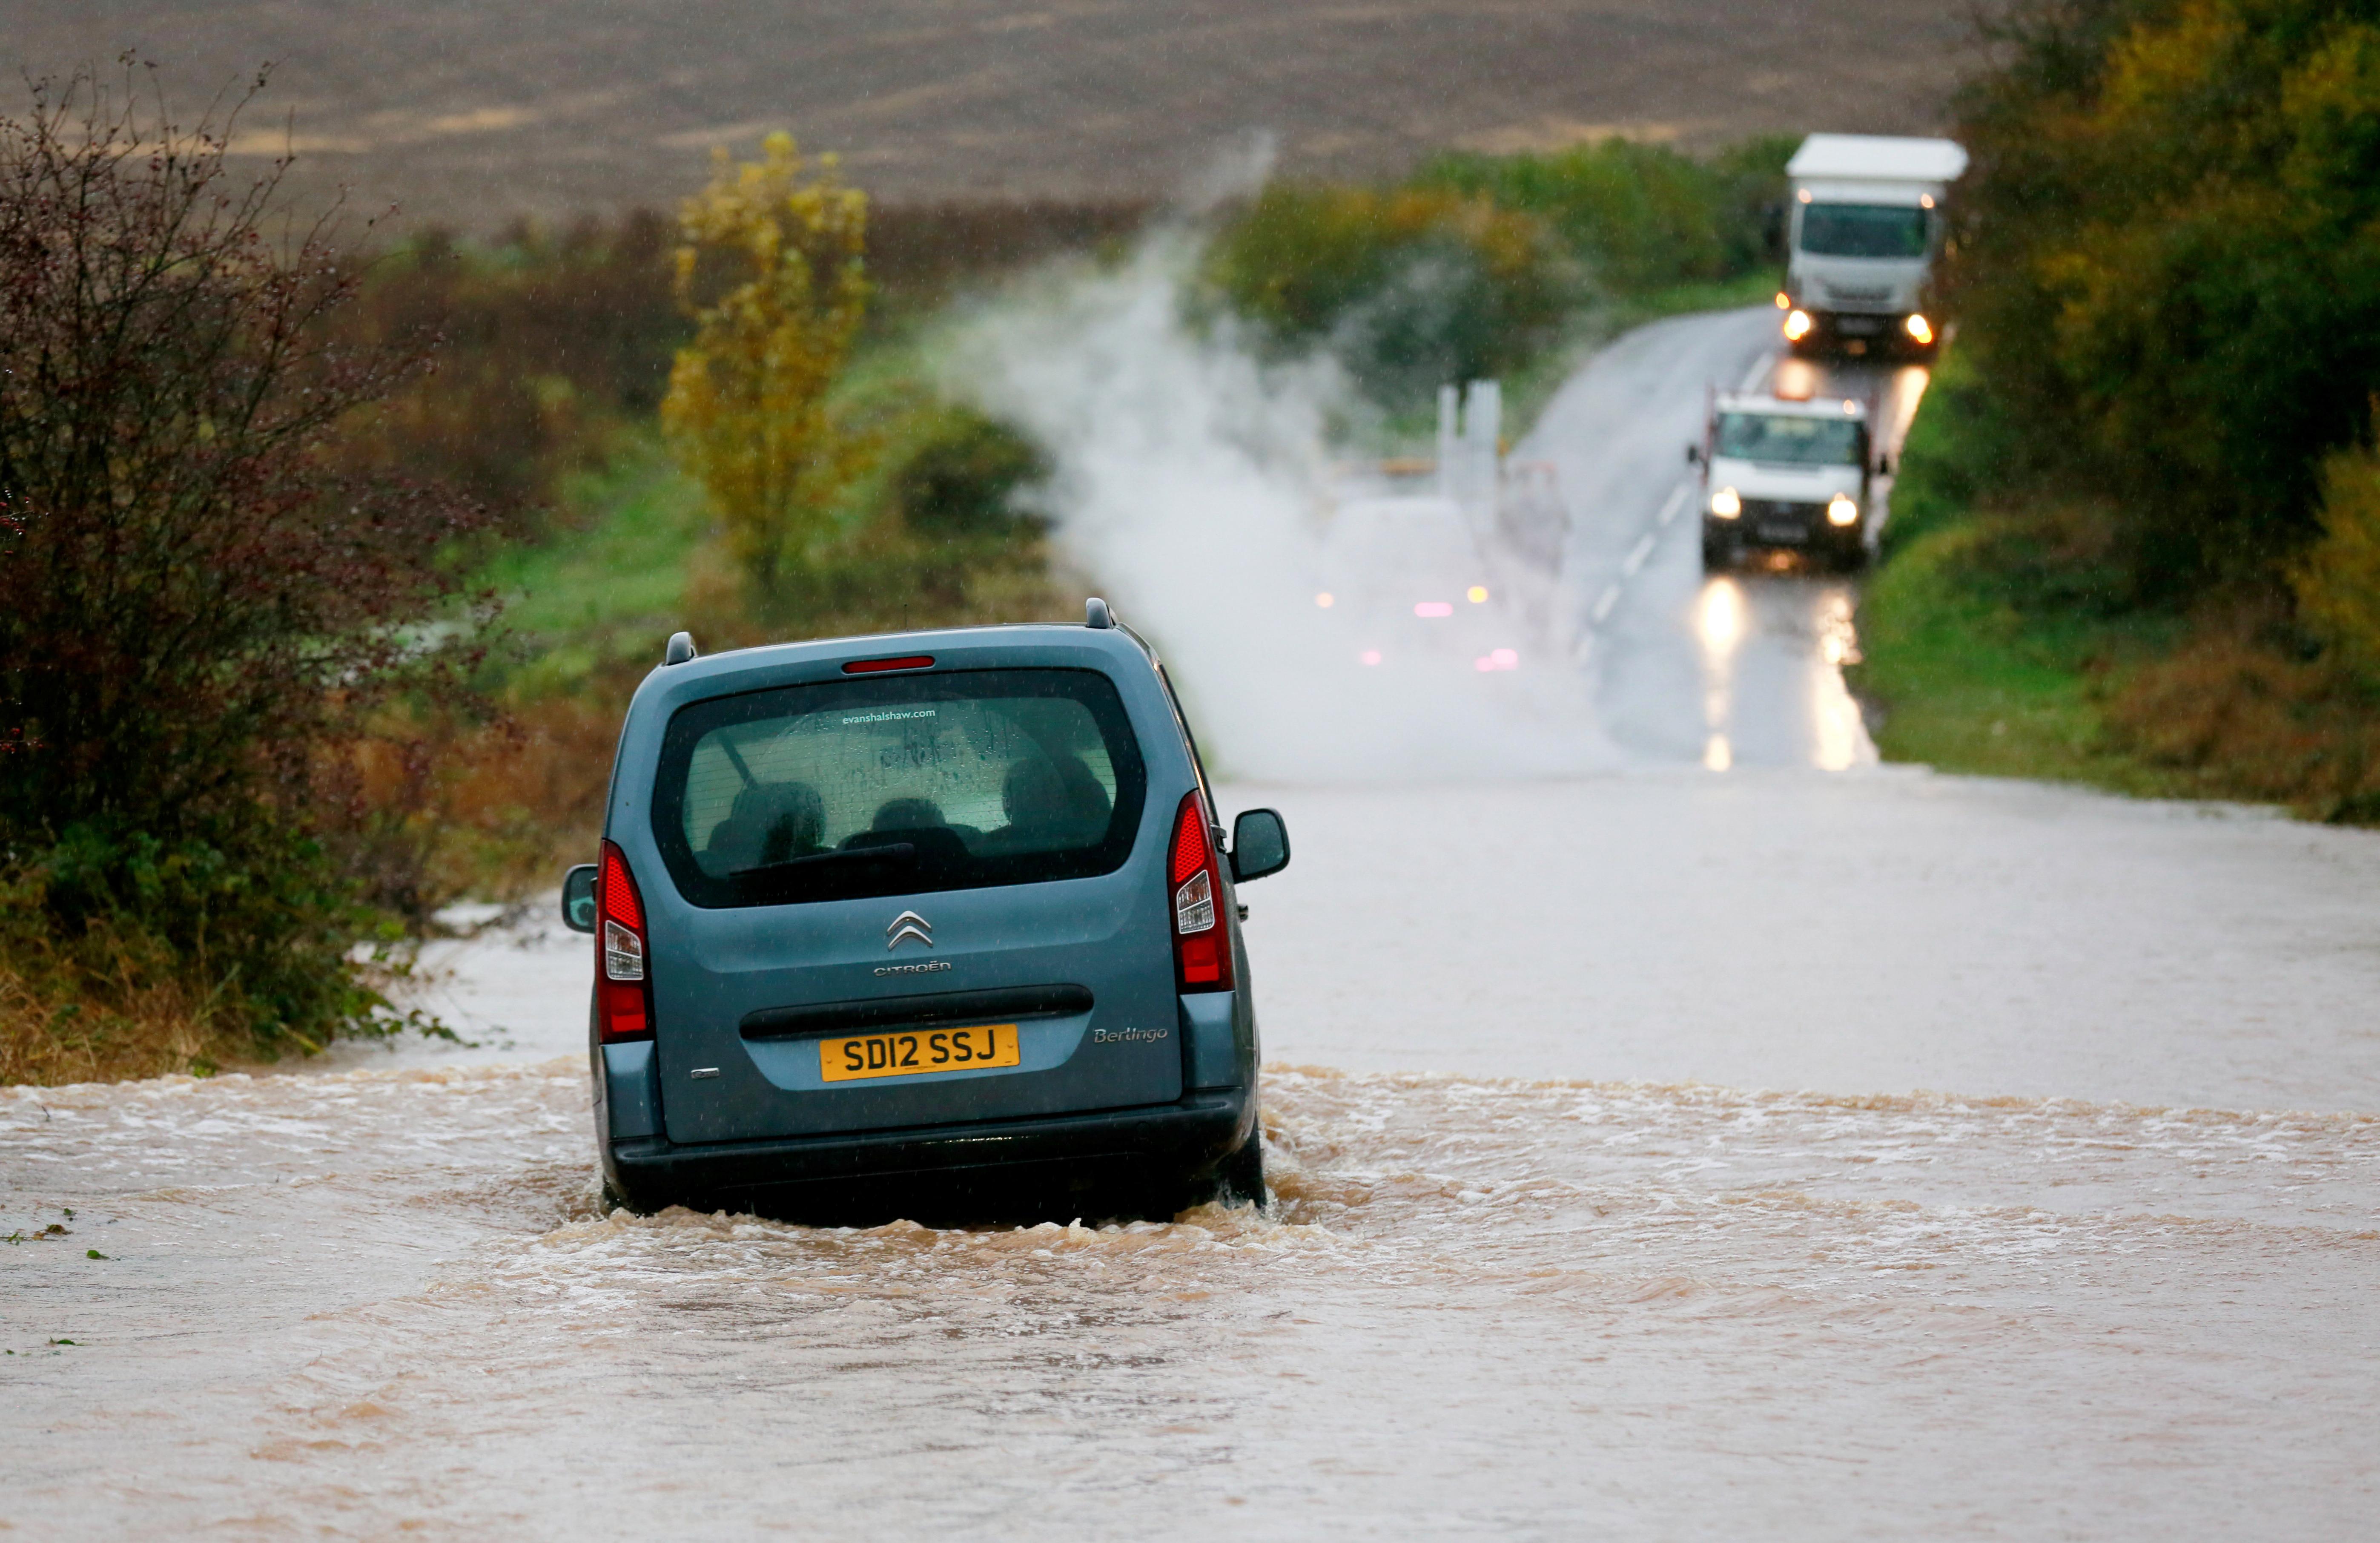 UK flooding: The rain has caused travel chaos across England overnight